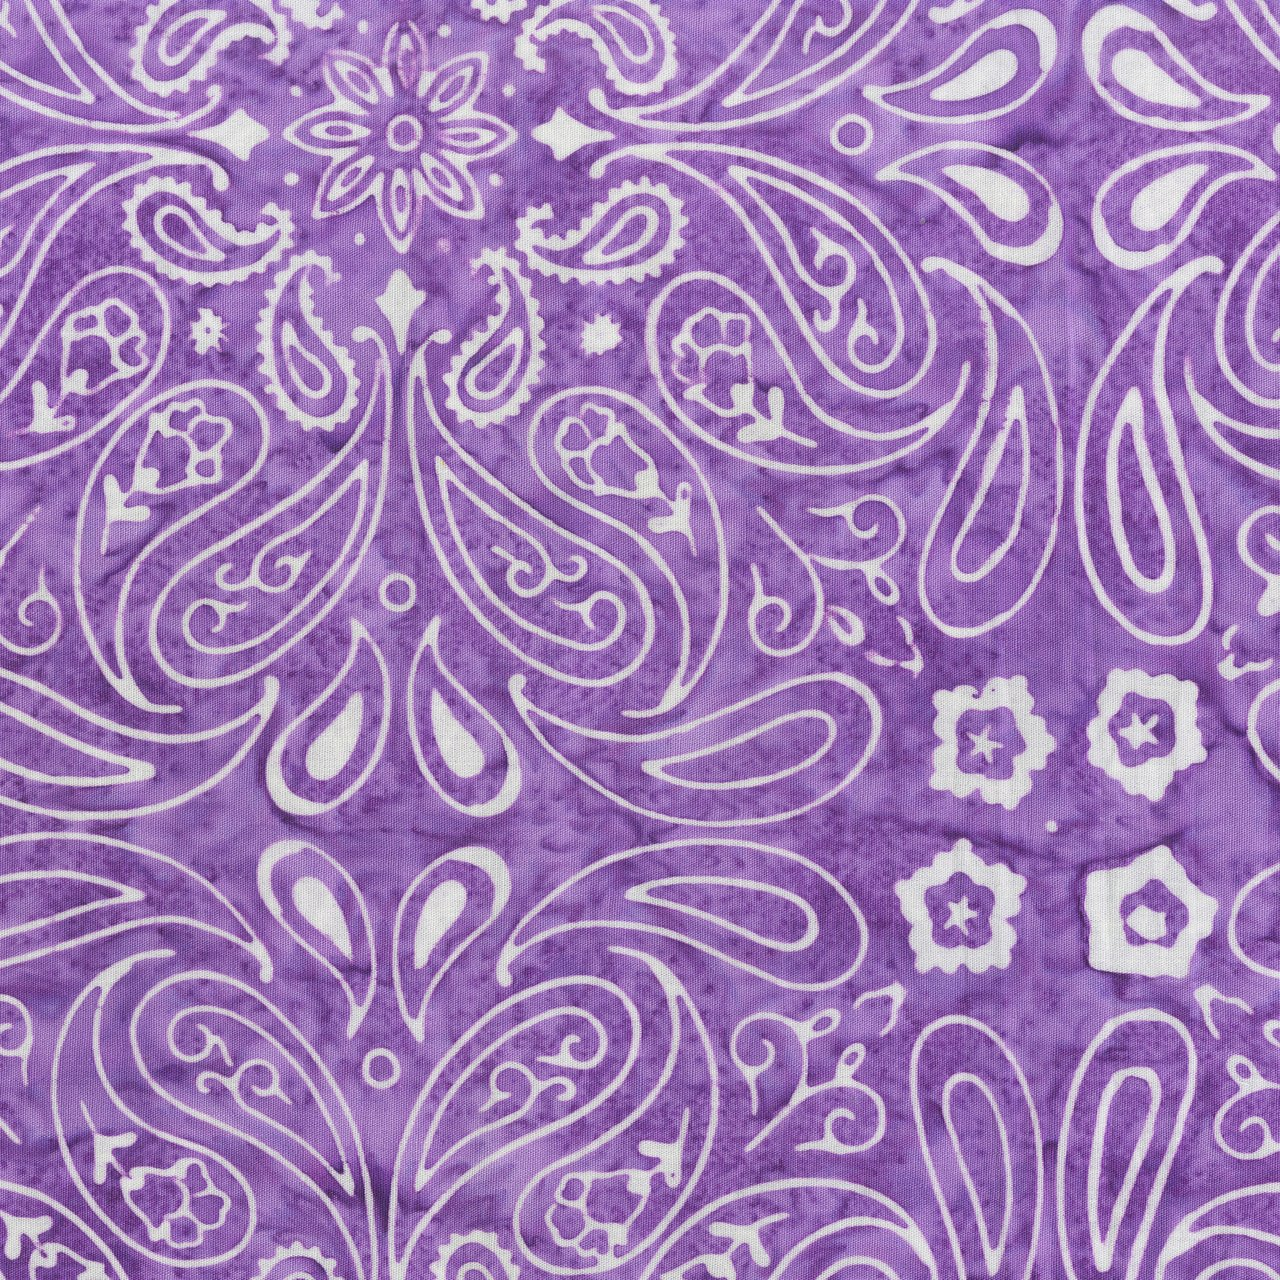 828Q-X Bandana Batiks by Anthology Fabrics